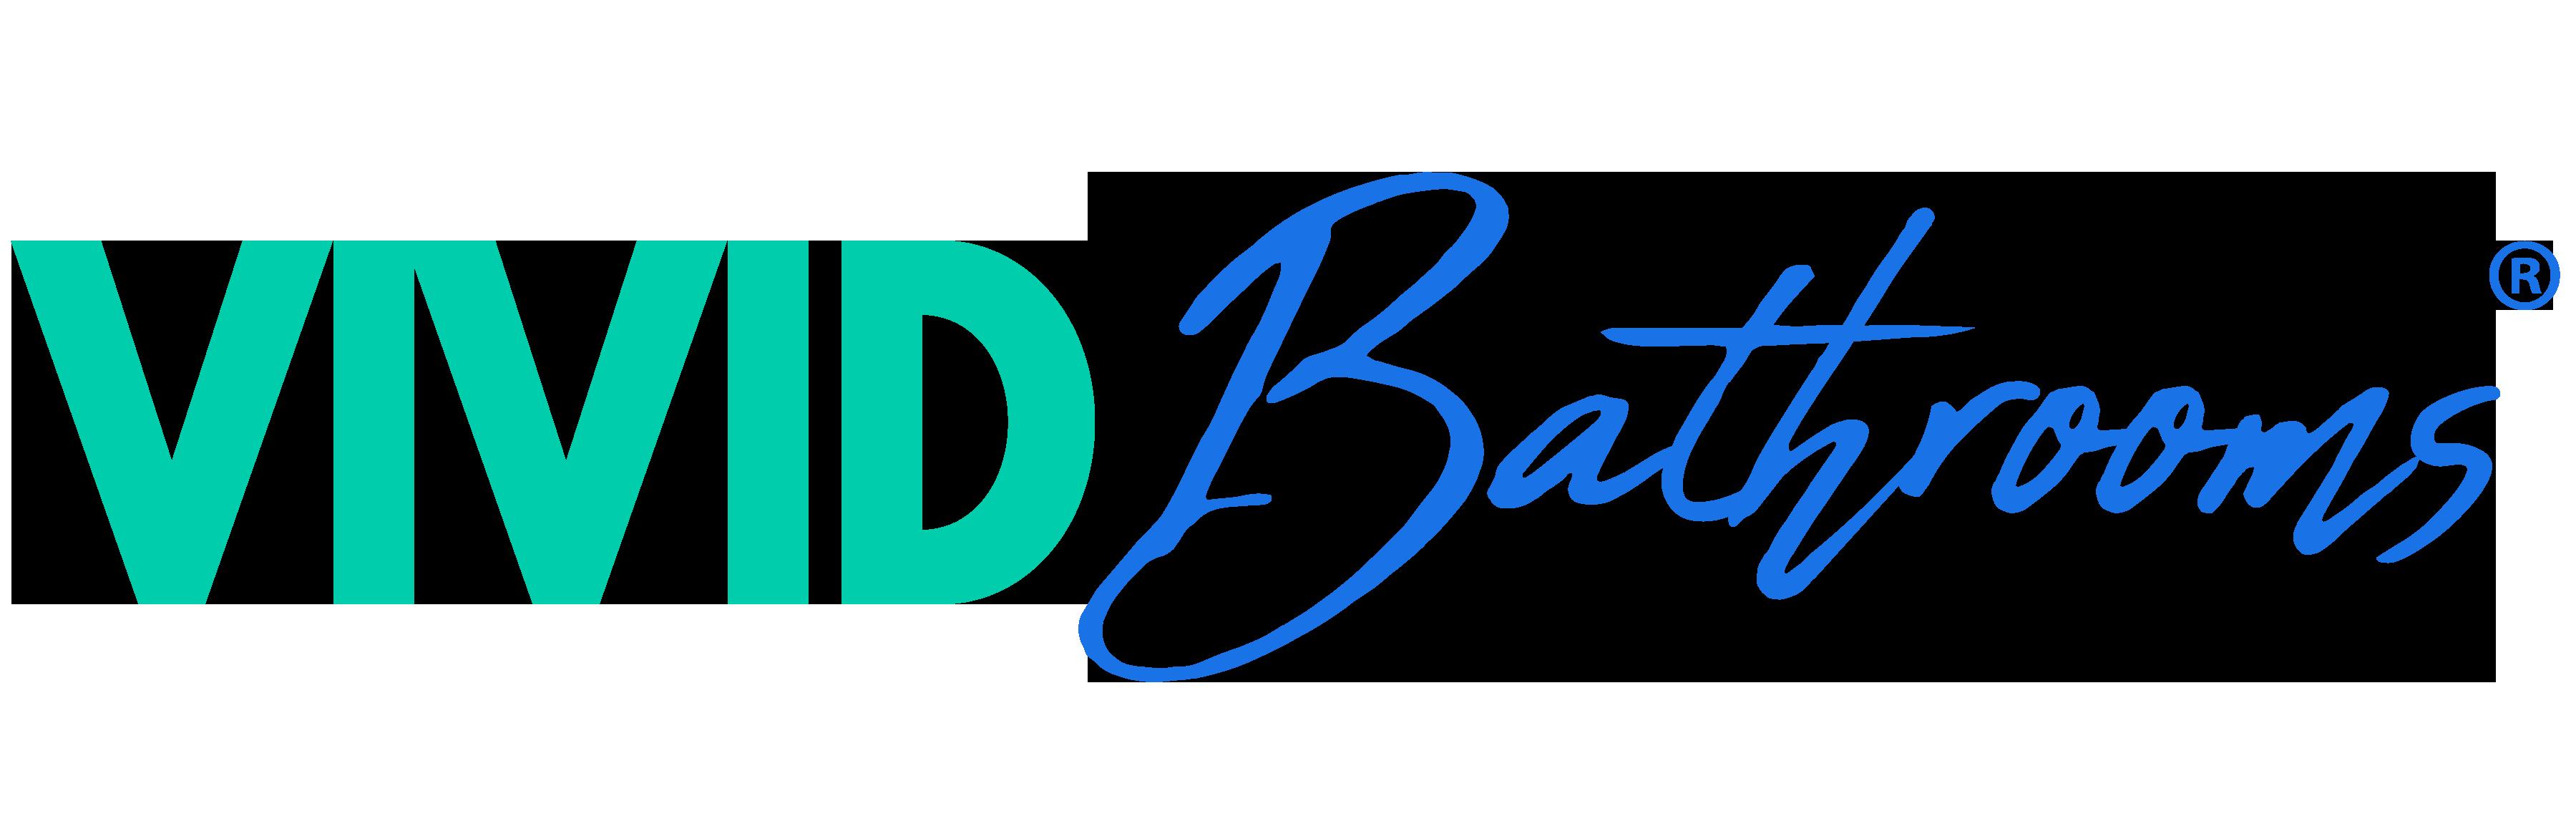 vivid bathroom renovation logo